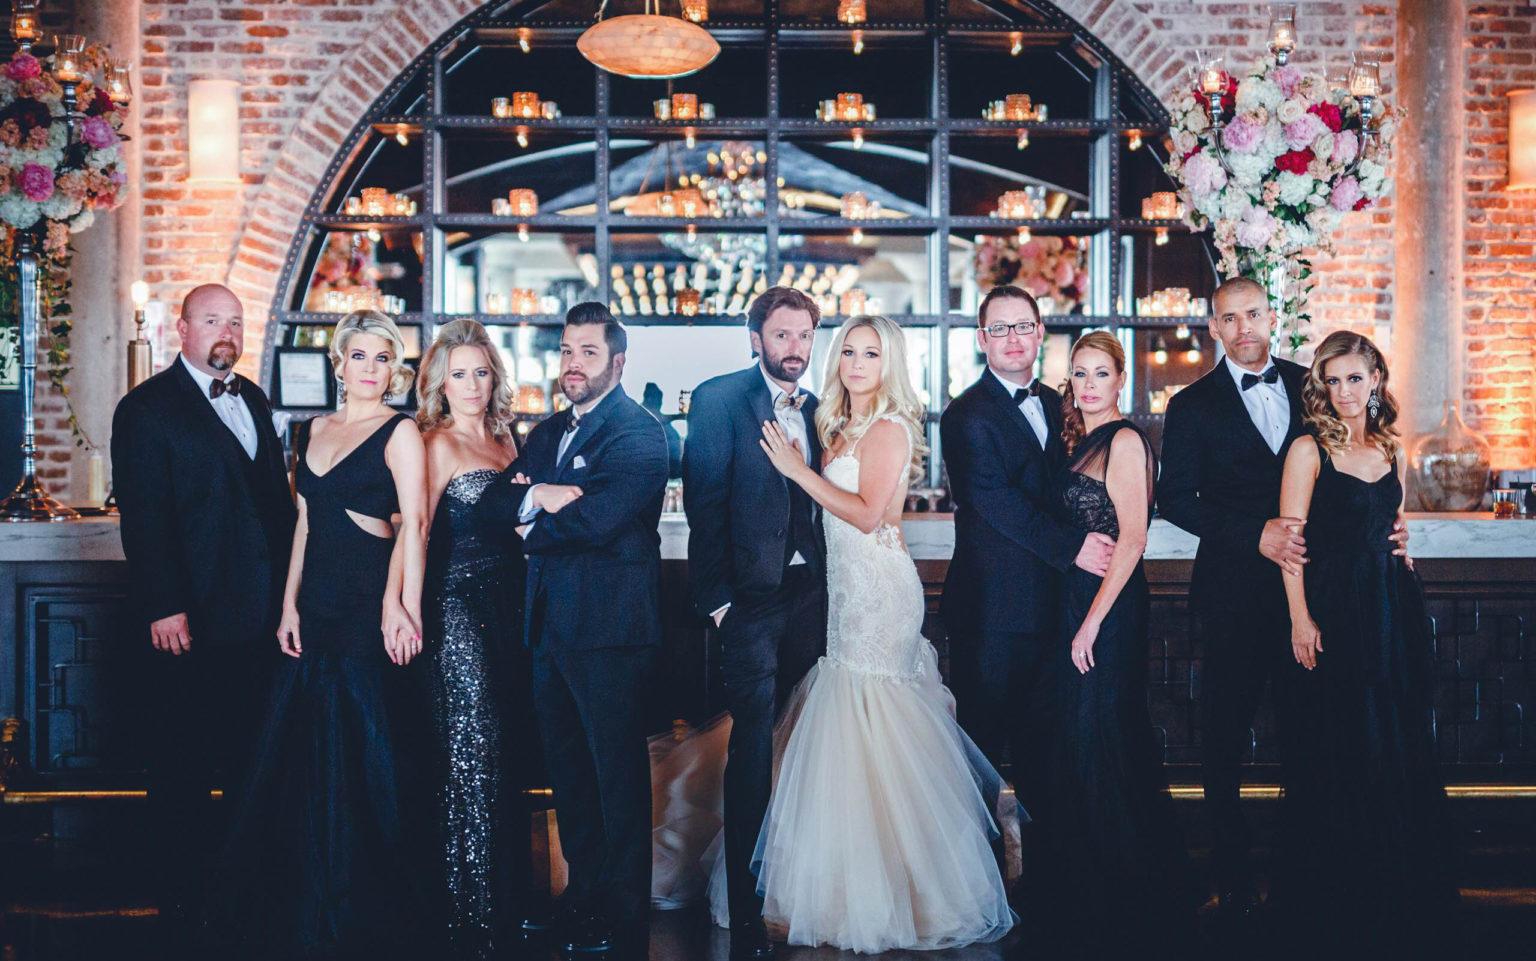 Wedding Venue, Houston, Texas, Industrial Chic, Ceremony, Reception, Luxury